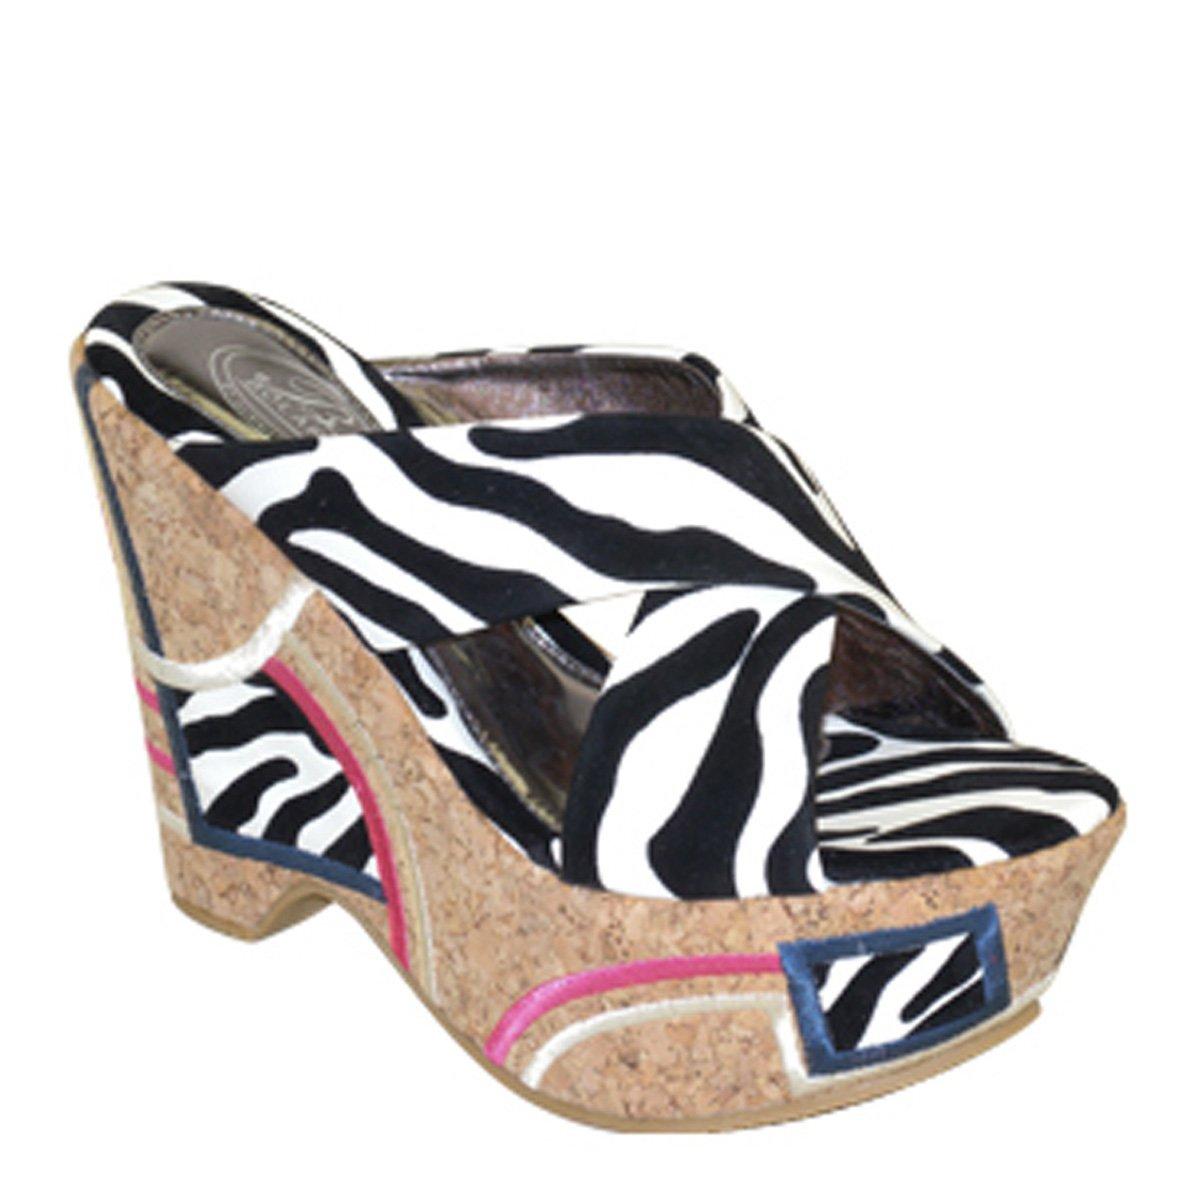 New Brieten Women's Sexy Cross Strap Platform Wedge Sandals B00IFTI4BU 8 B(M) US|Zebra